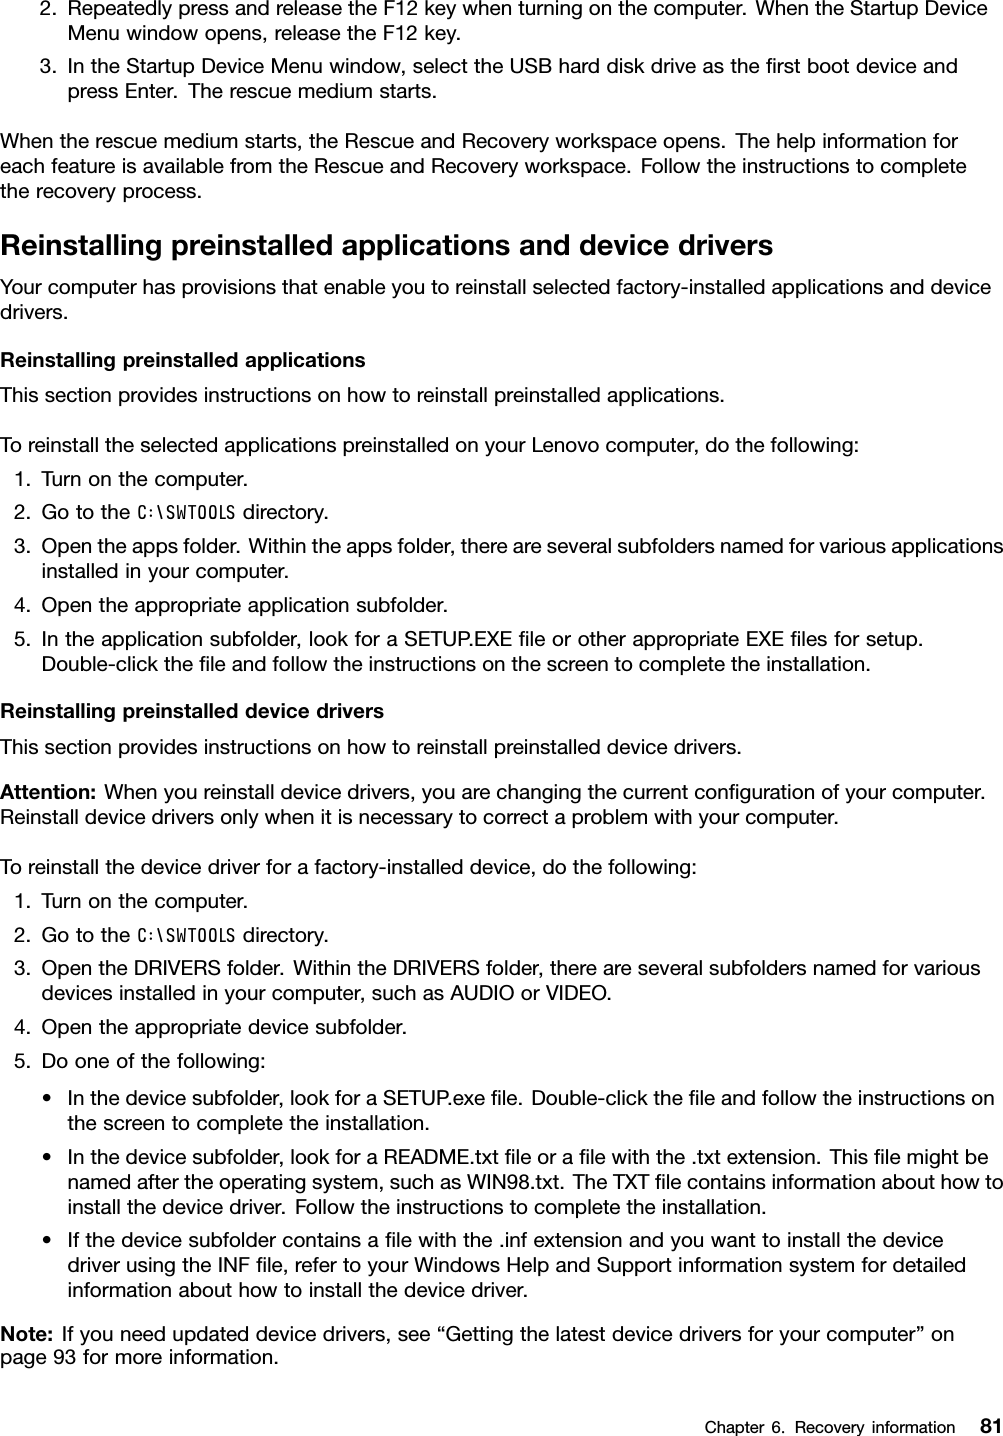 Lenovo M92P Tiny Ug En User Manual (English) Guide For Form Factor